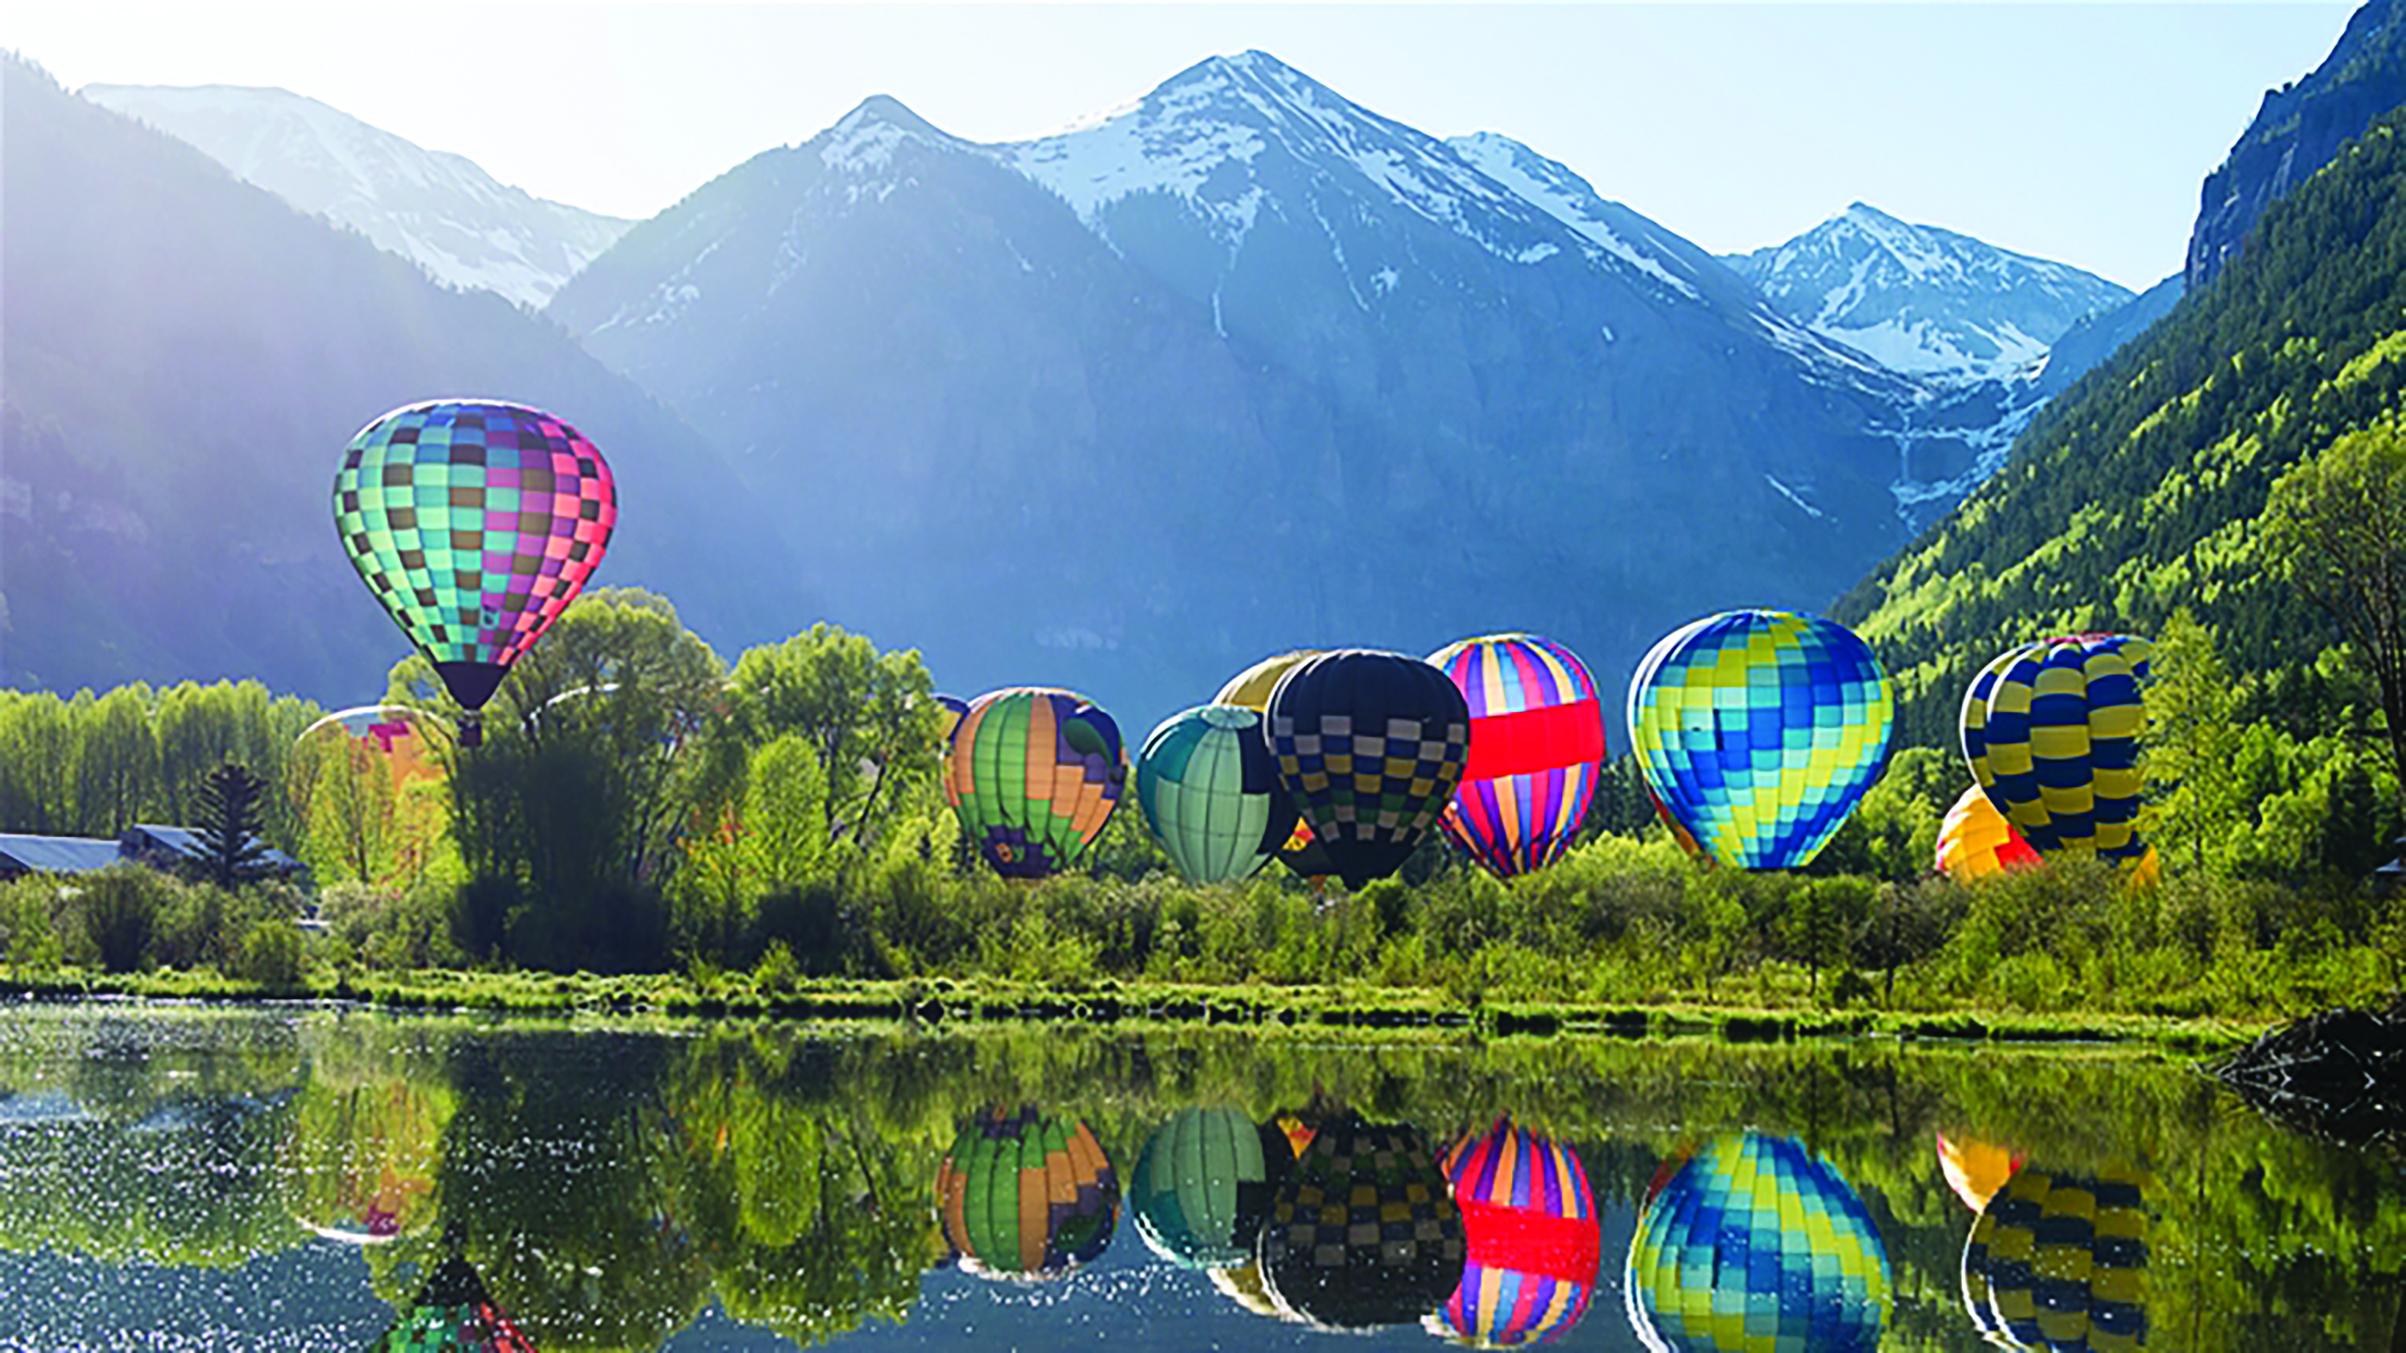 BalloonFest Reflection.jpg